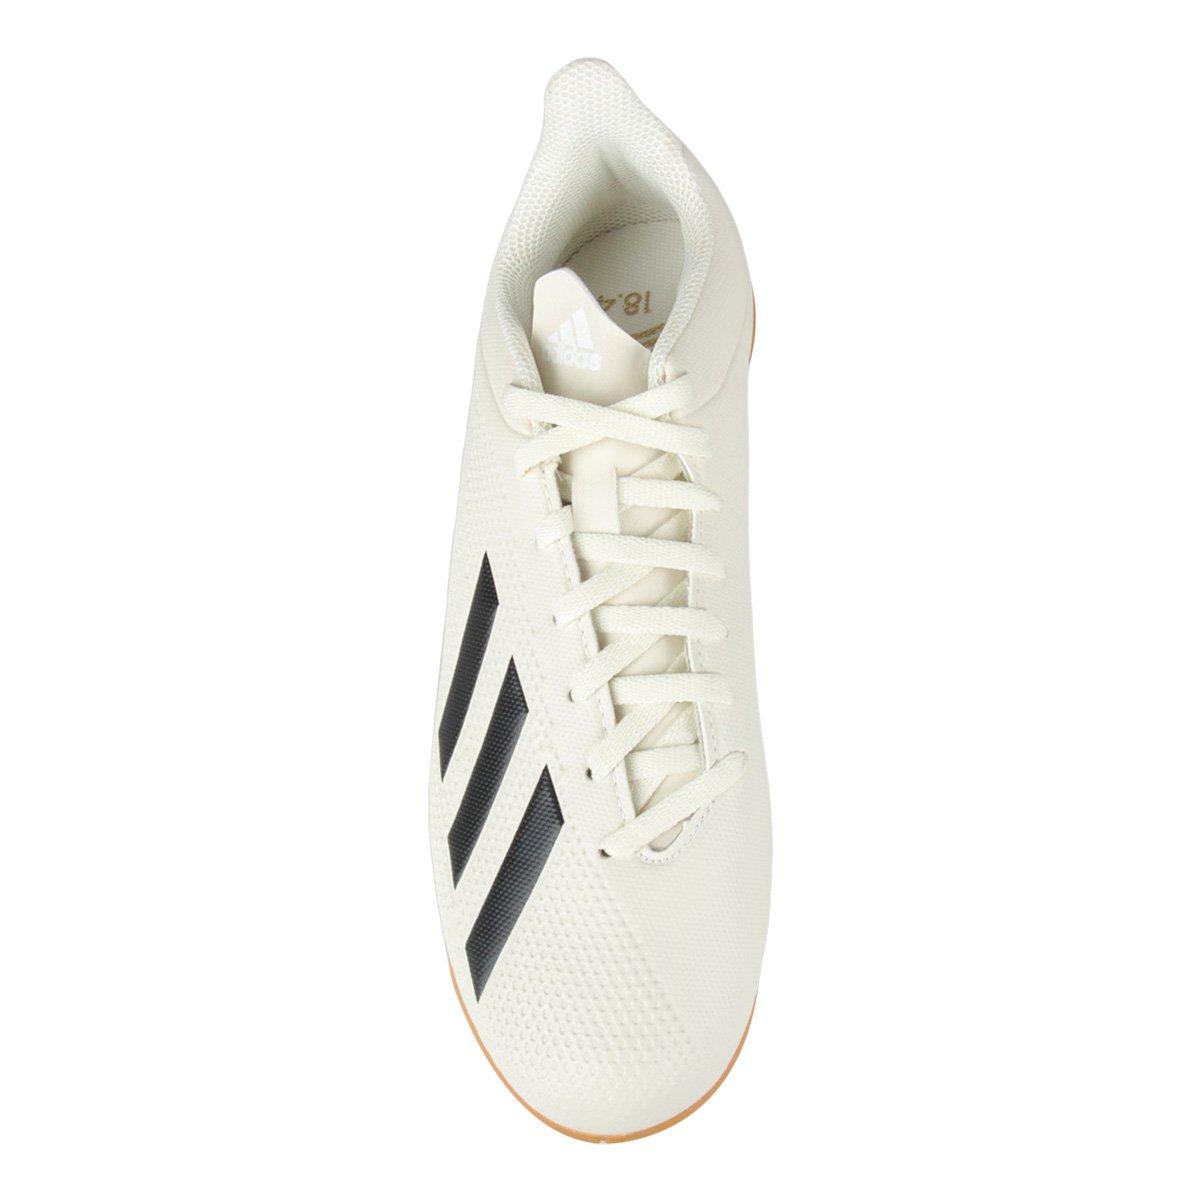 b28026a70f260 Chuteira Futsal Adidas X Tango 18 4 IN - Tam: 39 - Shopping TudoAzul